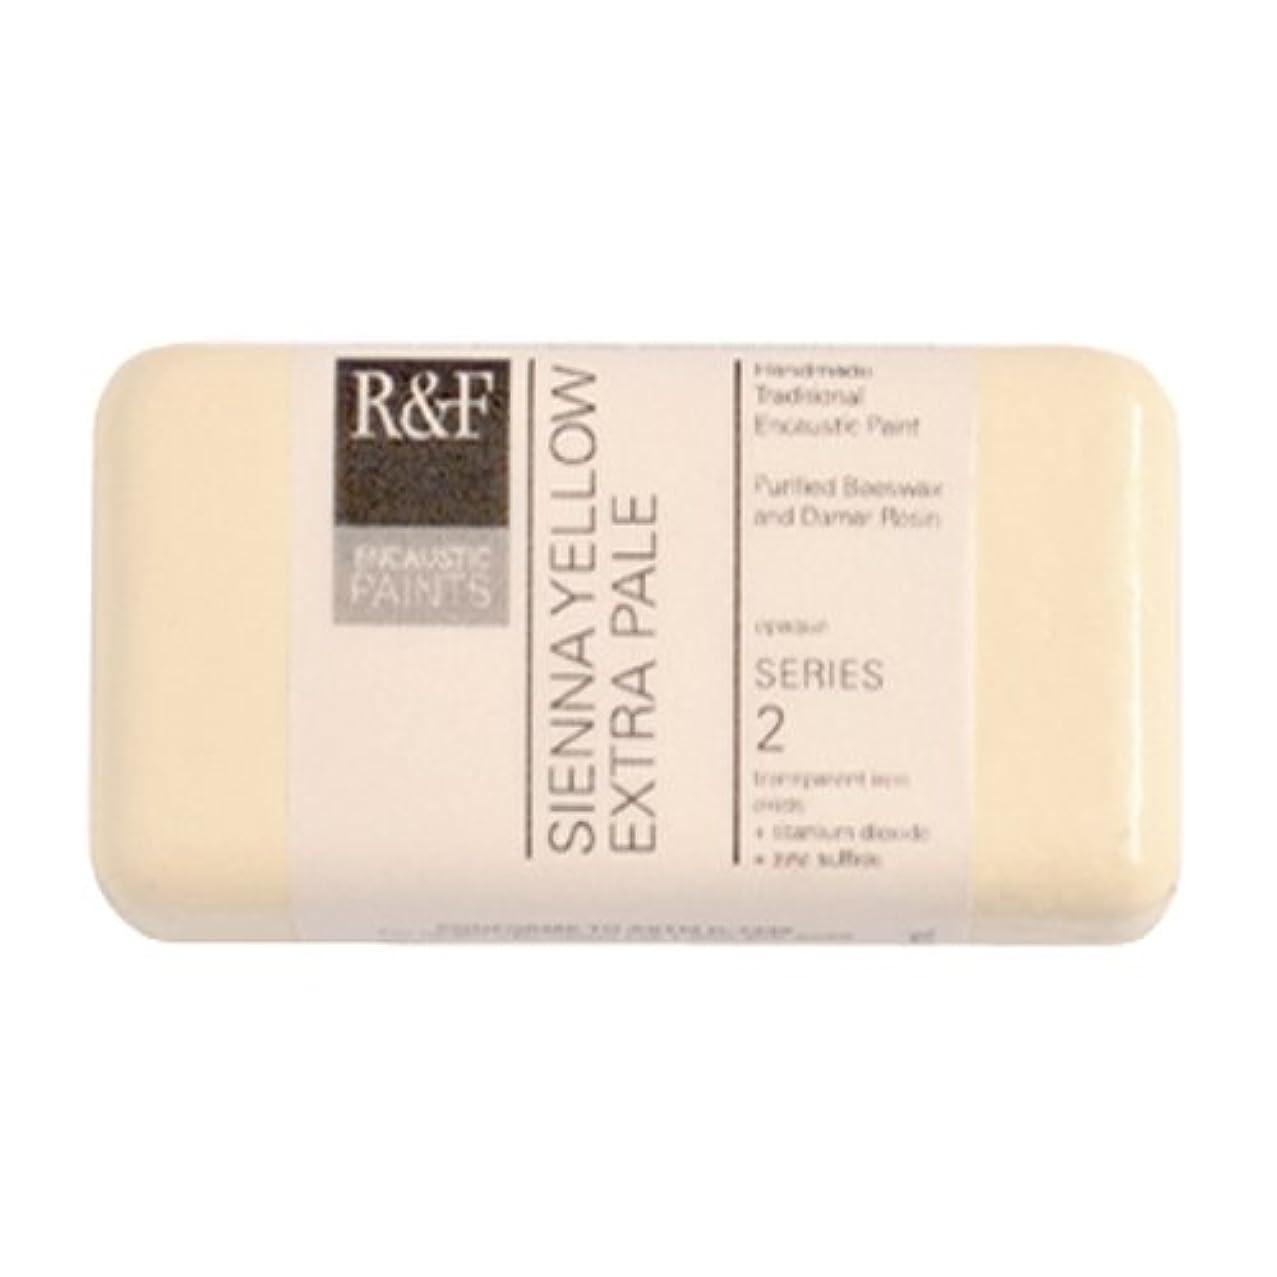 R&F Encaustic Paints, 40ml, Sienna Yellow Extra Pale